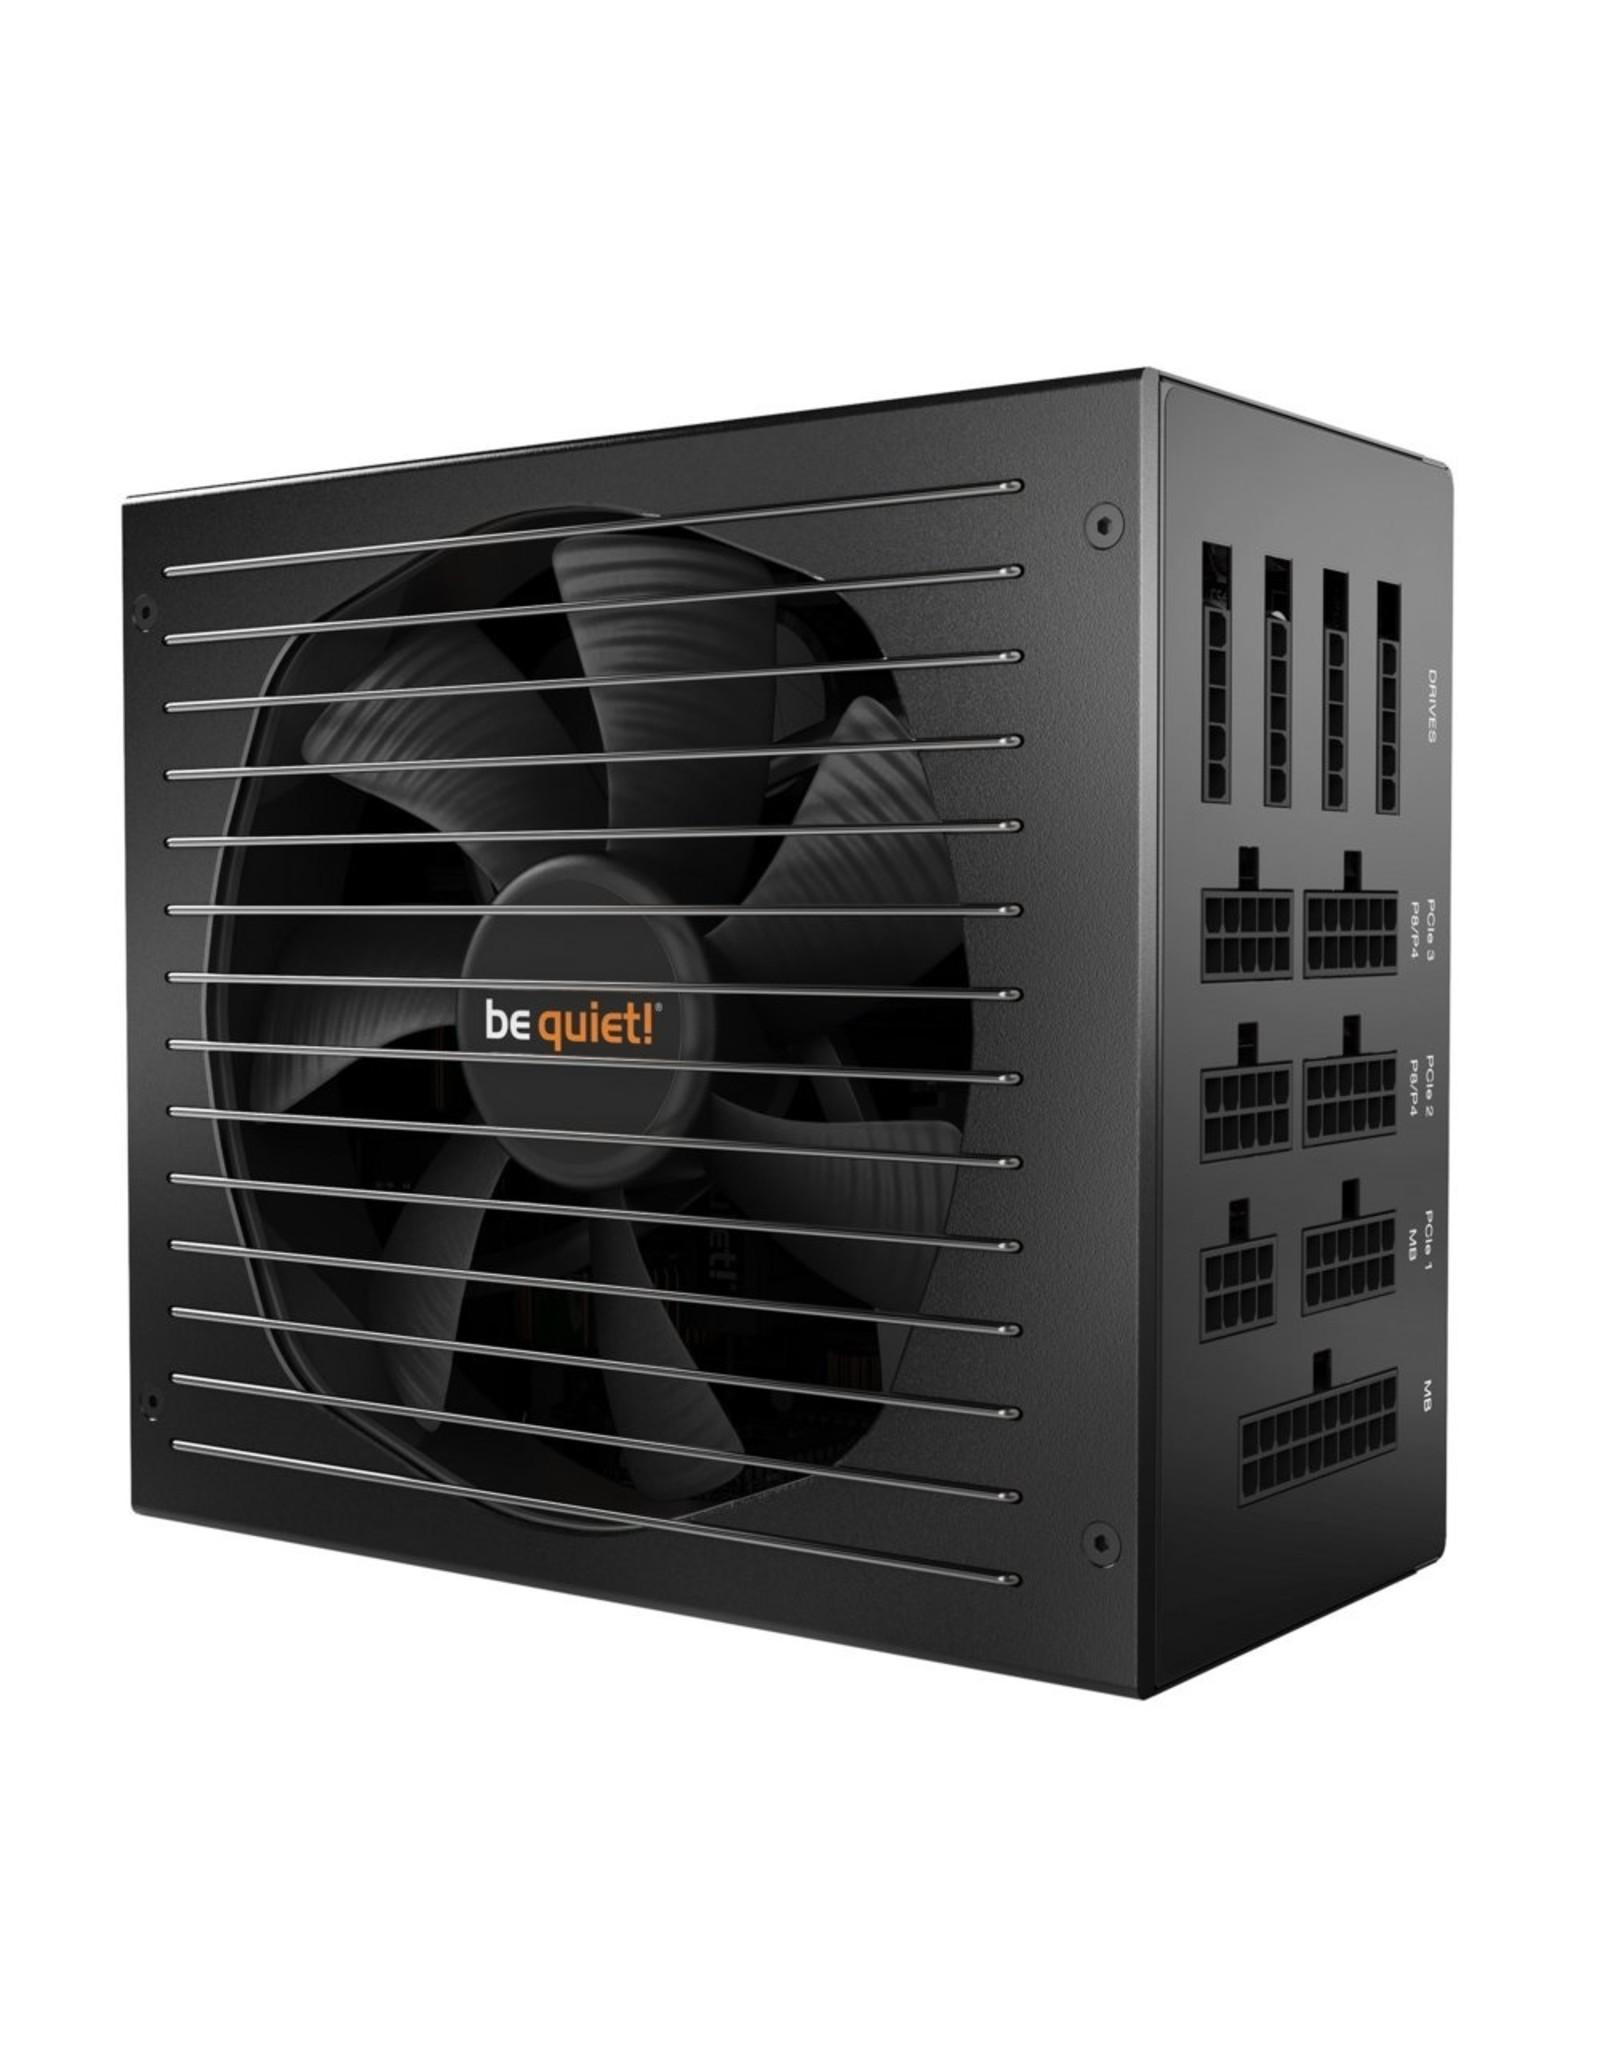 be quiet! PSU Be quiet! Straight Power 11 850W 20+4 pin ATX Zwart